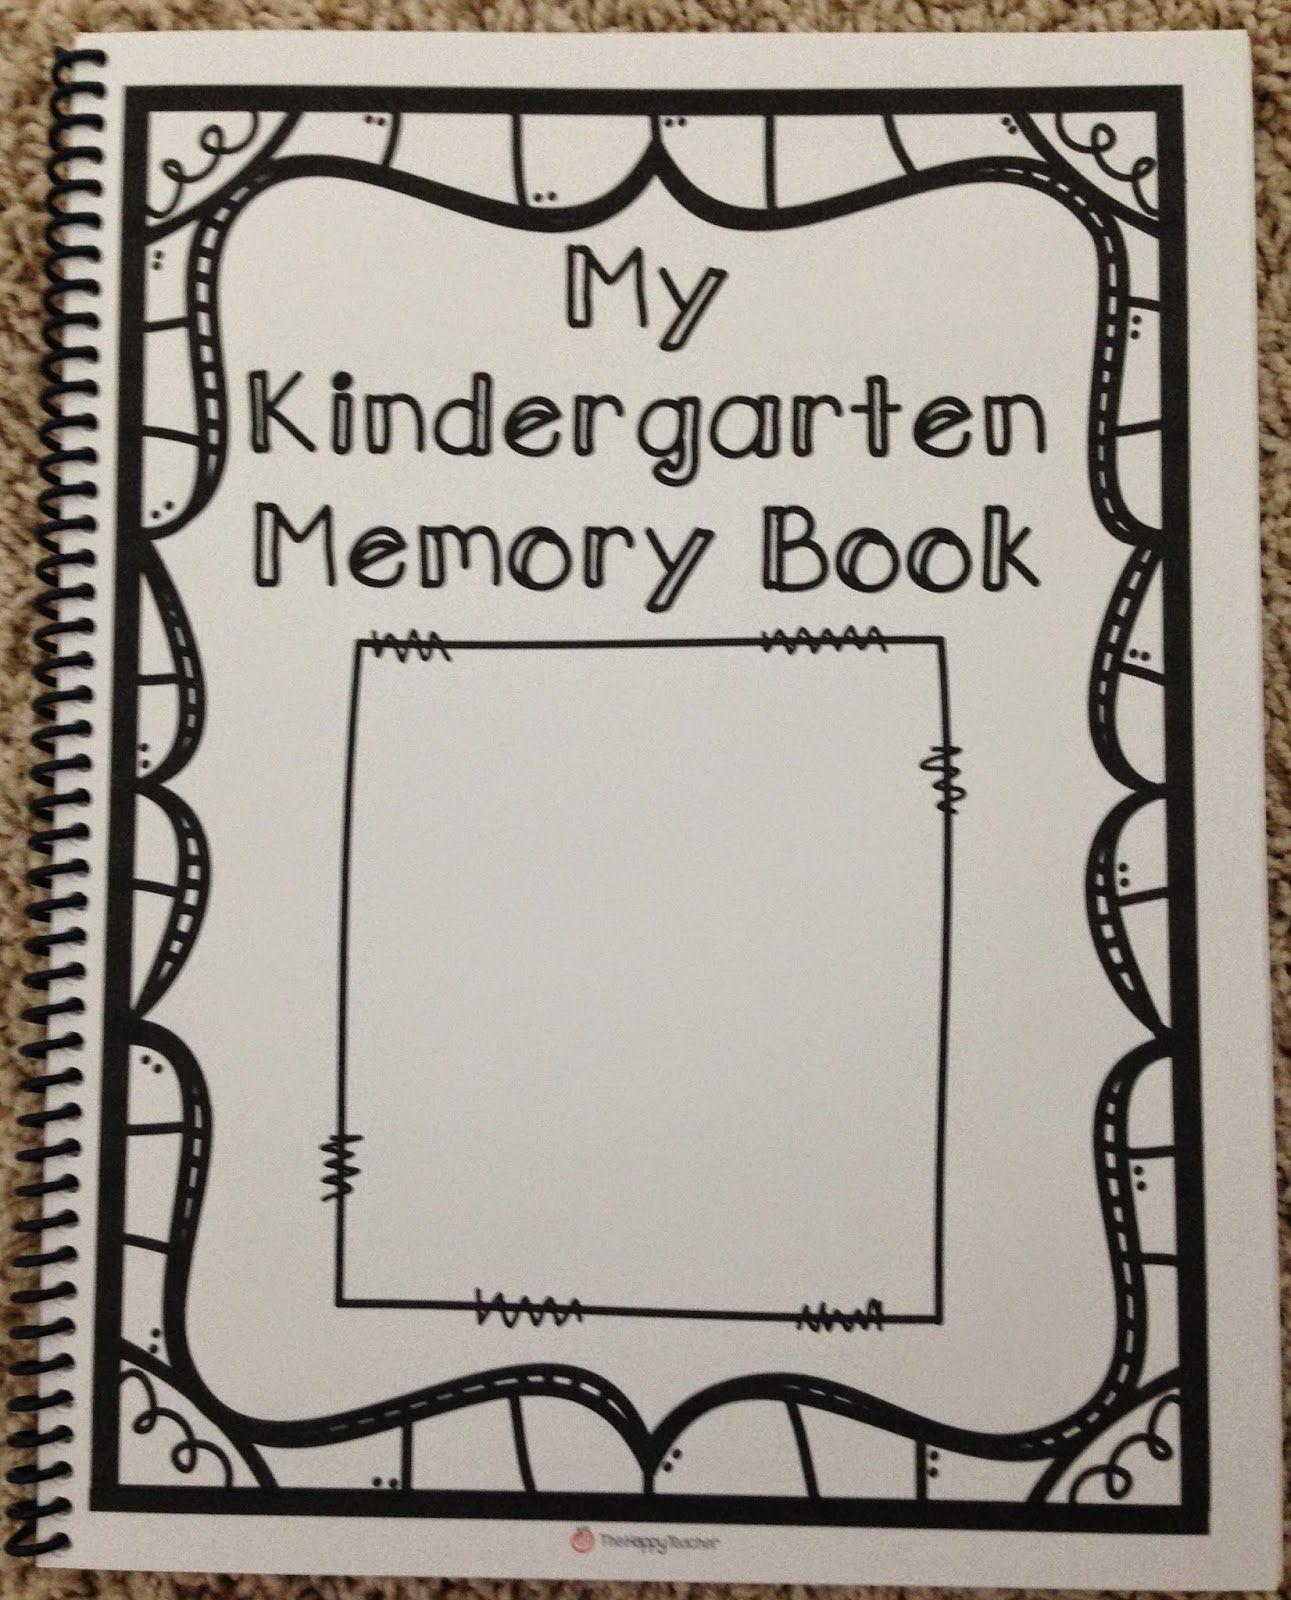 Kindergarten Memory Book   Kindergartenklub   Pinterest - Free Printable Preschool Memory Book